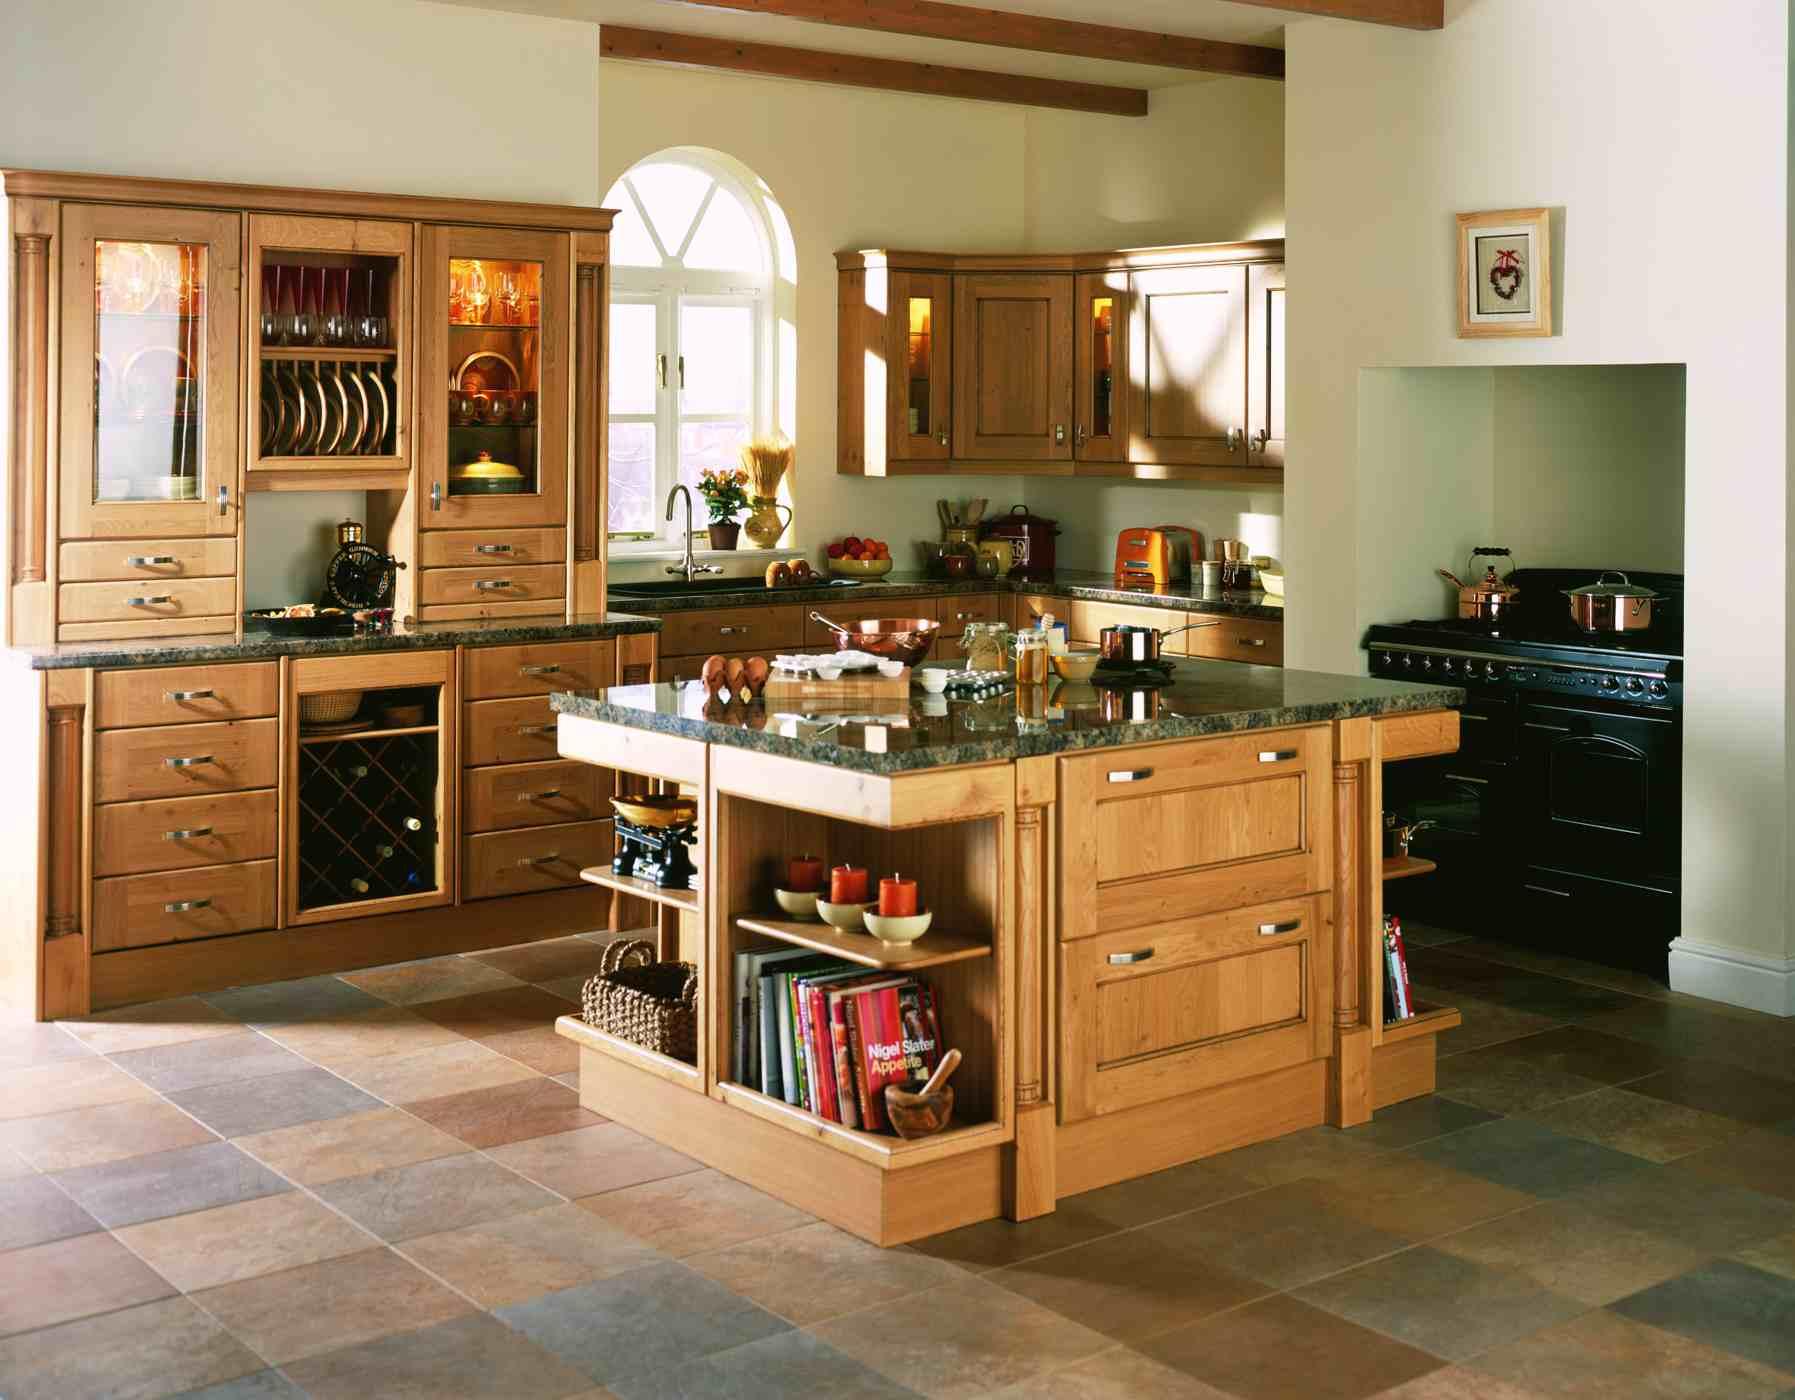 Playful Farmhouse Kitchen Design Ideas For Retro Looks On